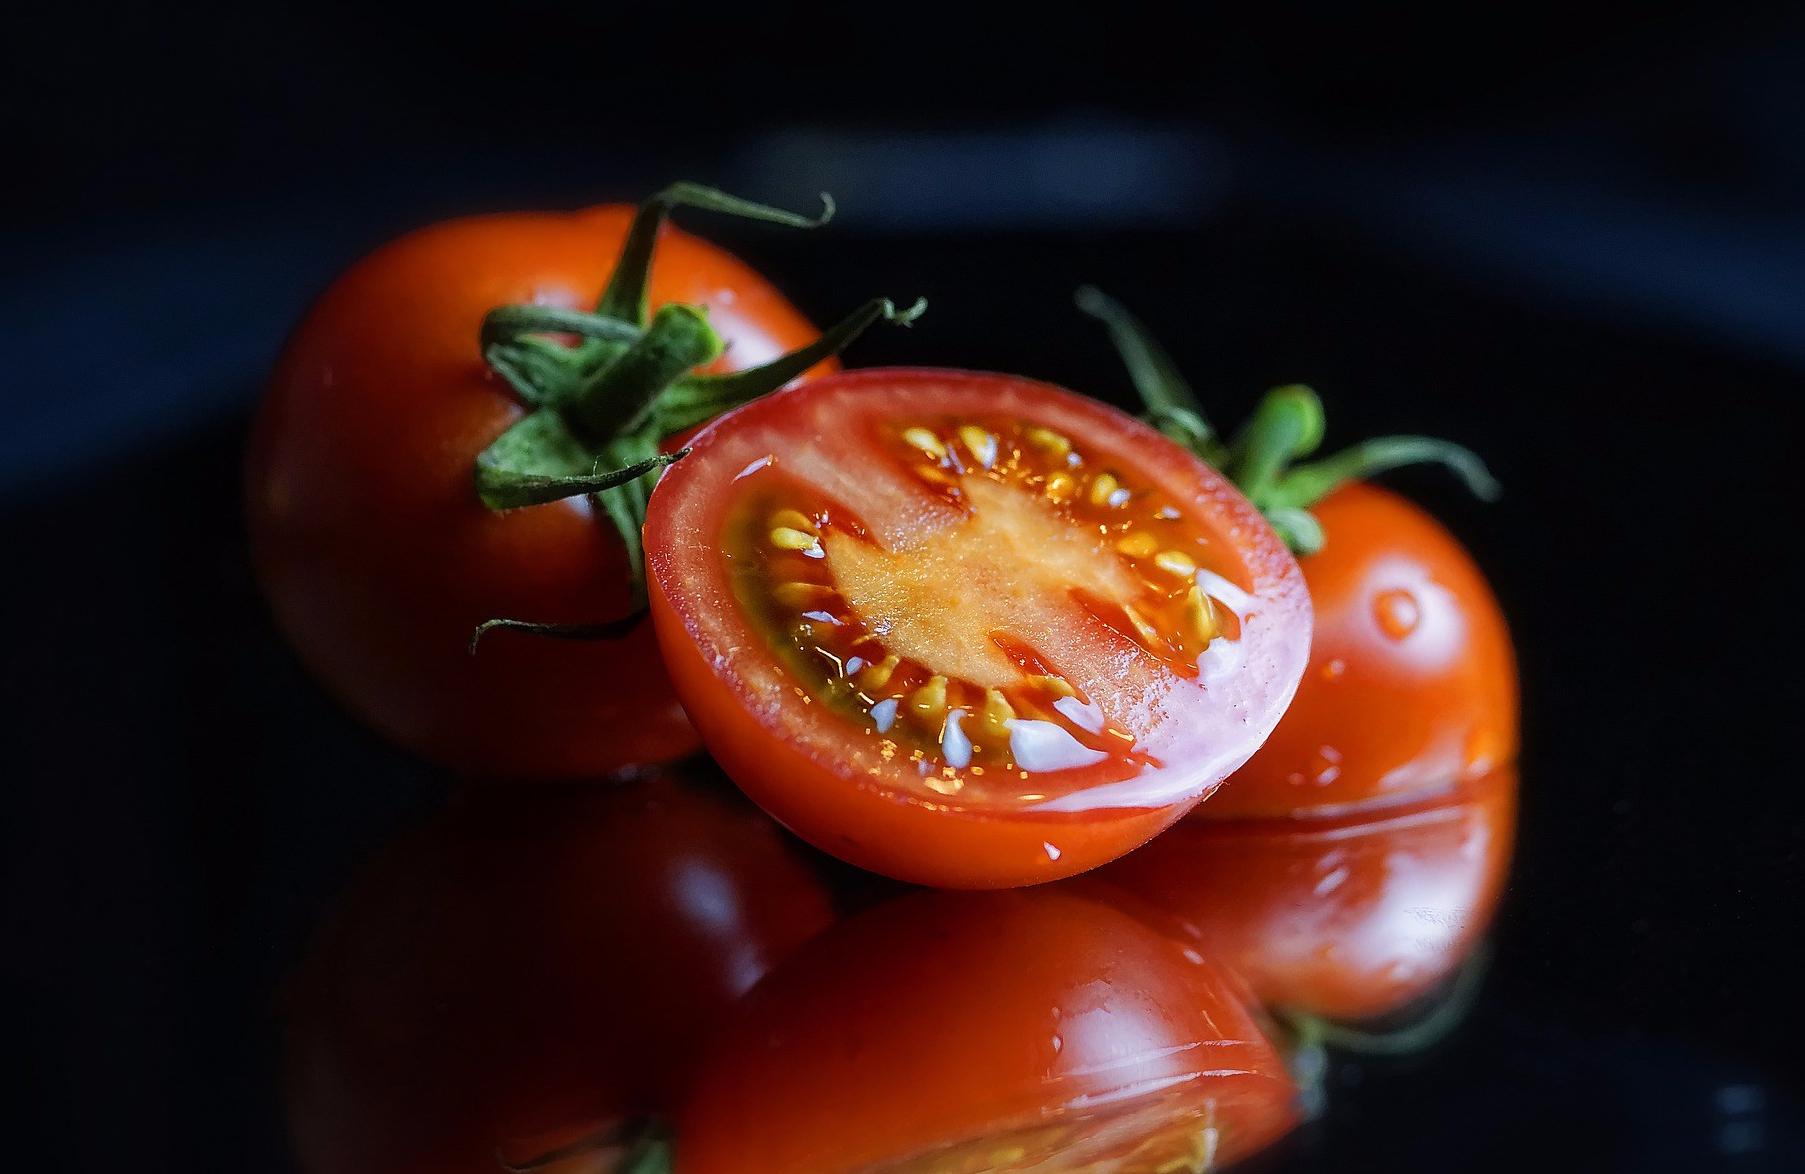 vegetables-1772527_1920.jpg